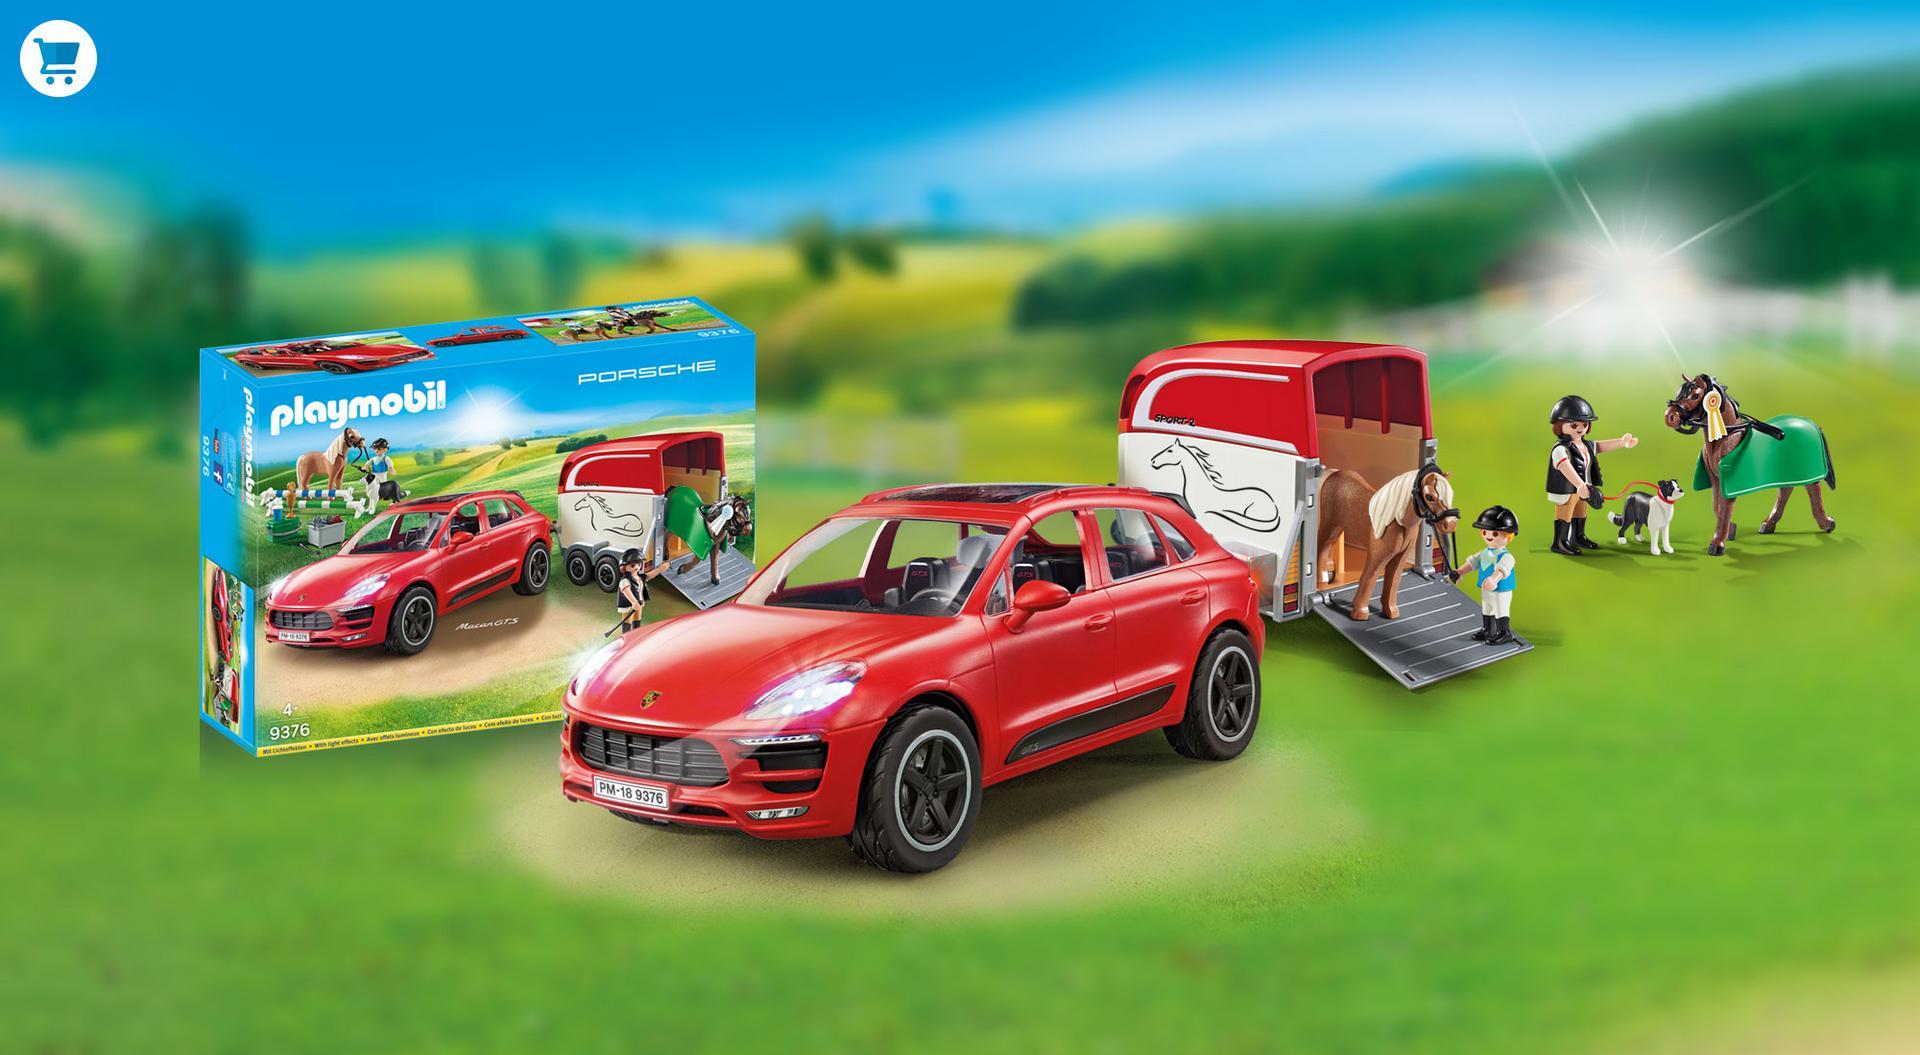 Ausmalbilder Playmobil Porsche : Fein Playmobil Aquapark Ausmalbilder Galerie Malvorlagen Ideen